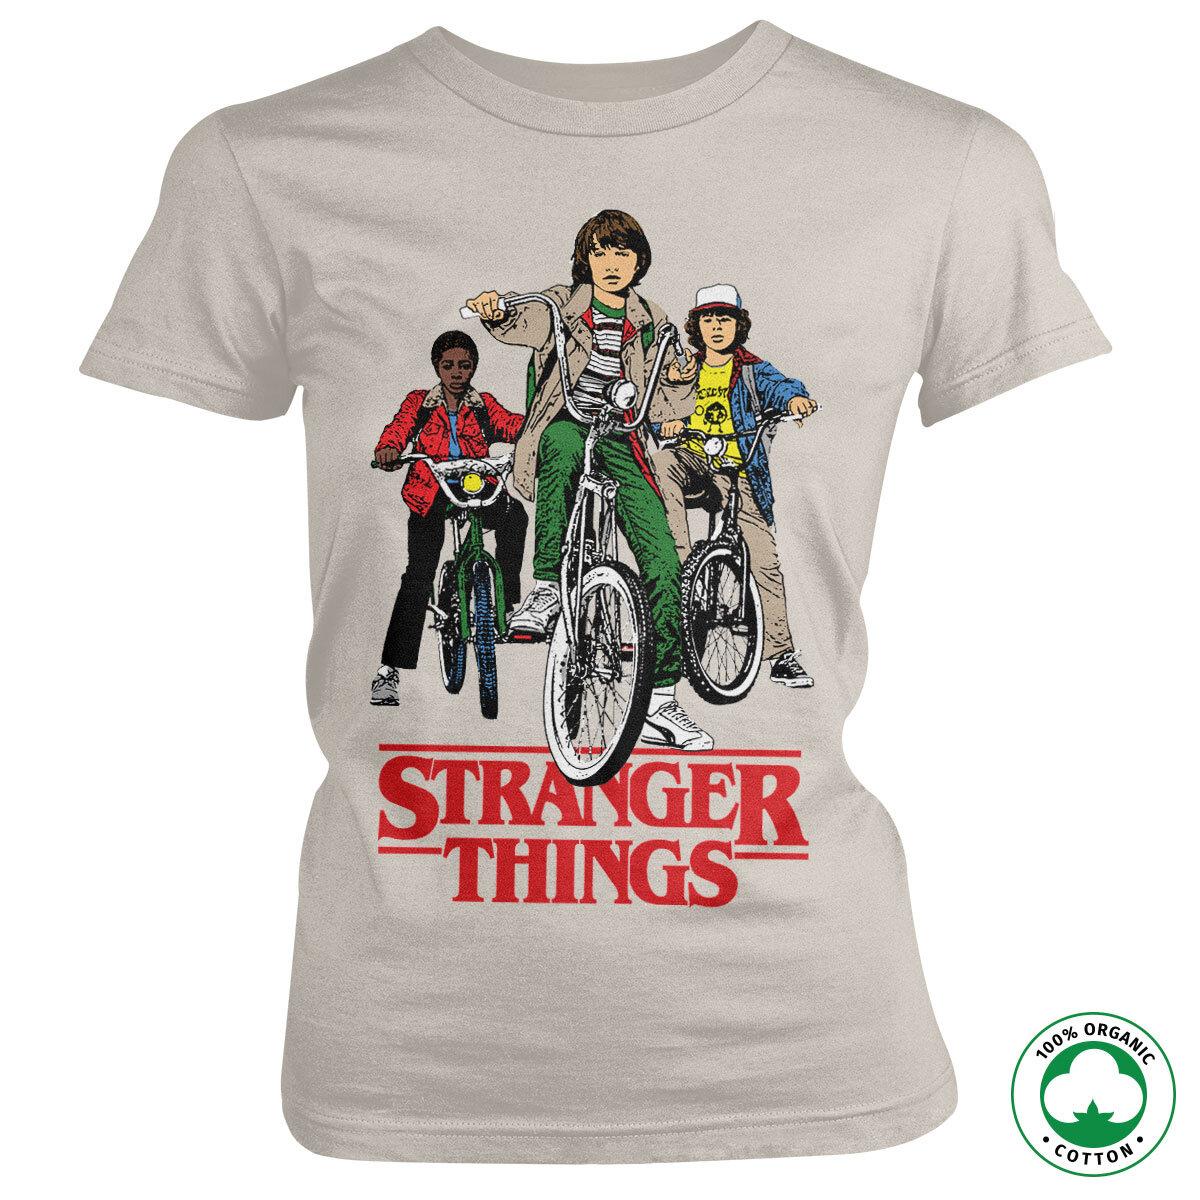 Stranger Things Bikes Organic Girly Tee